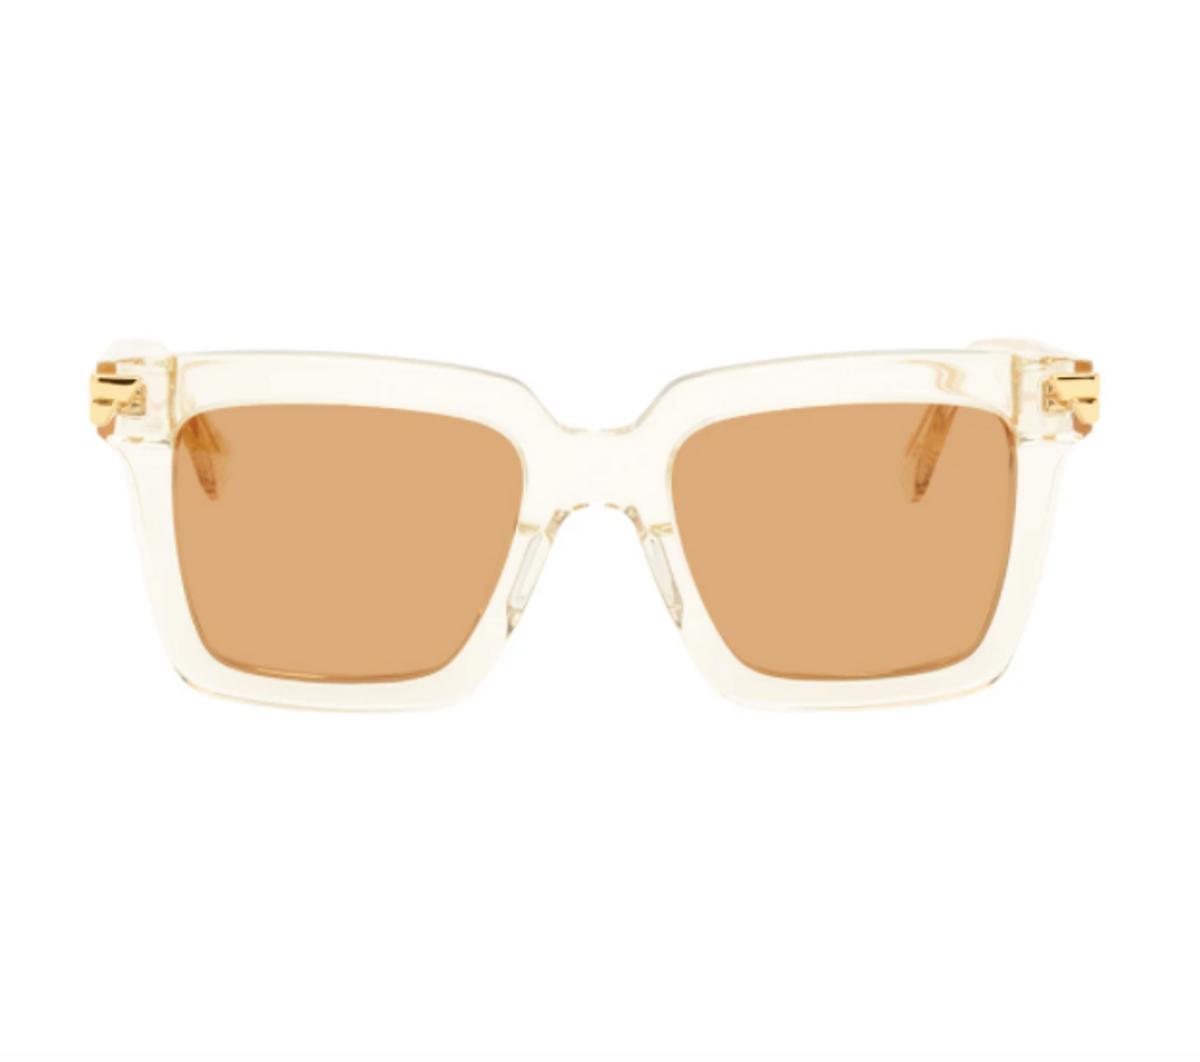 Beige Thick Sunglasses